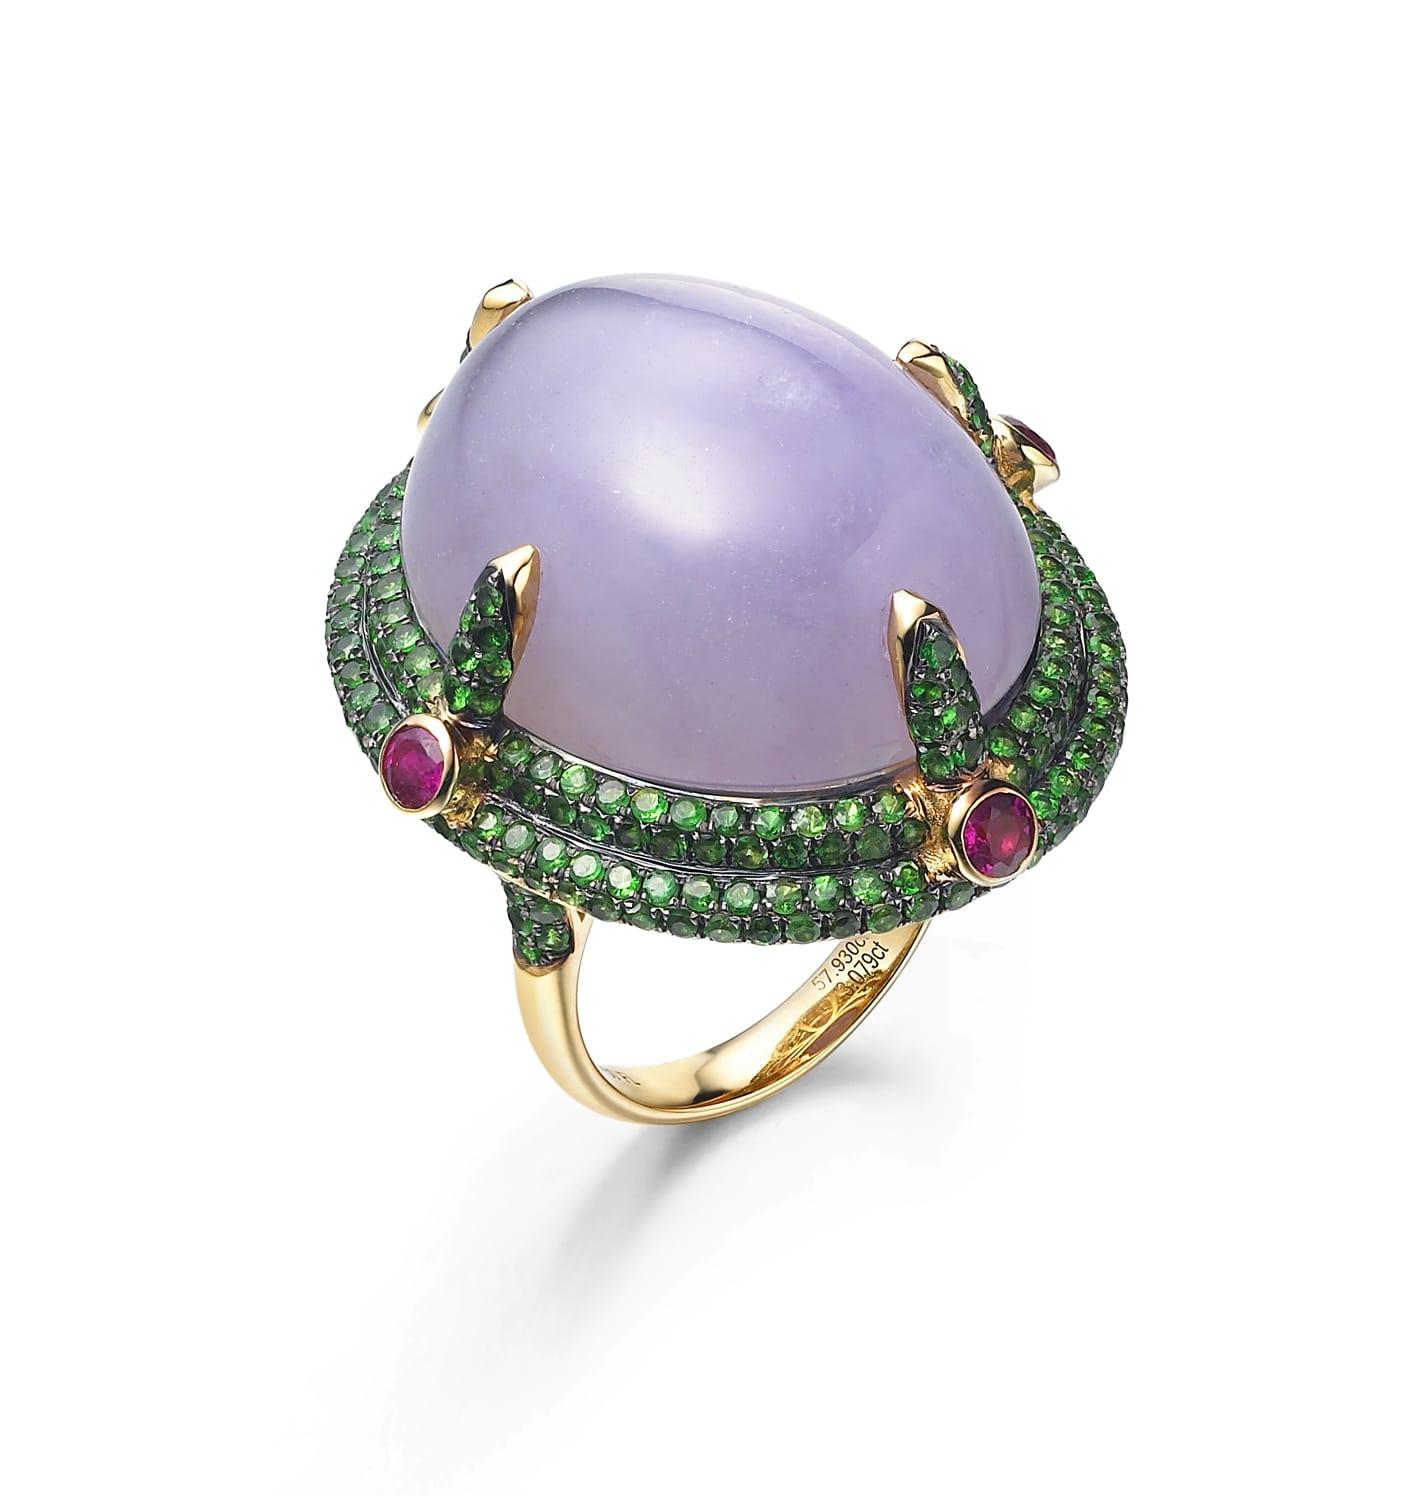 JADE-Lavendar-jade-ring-by-Fei-Liu